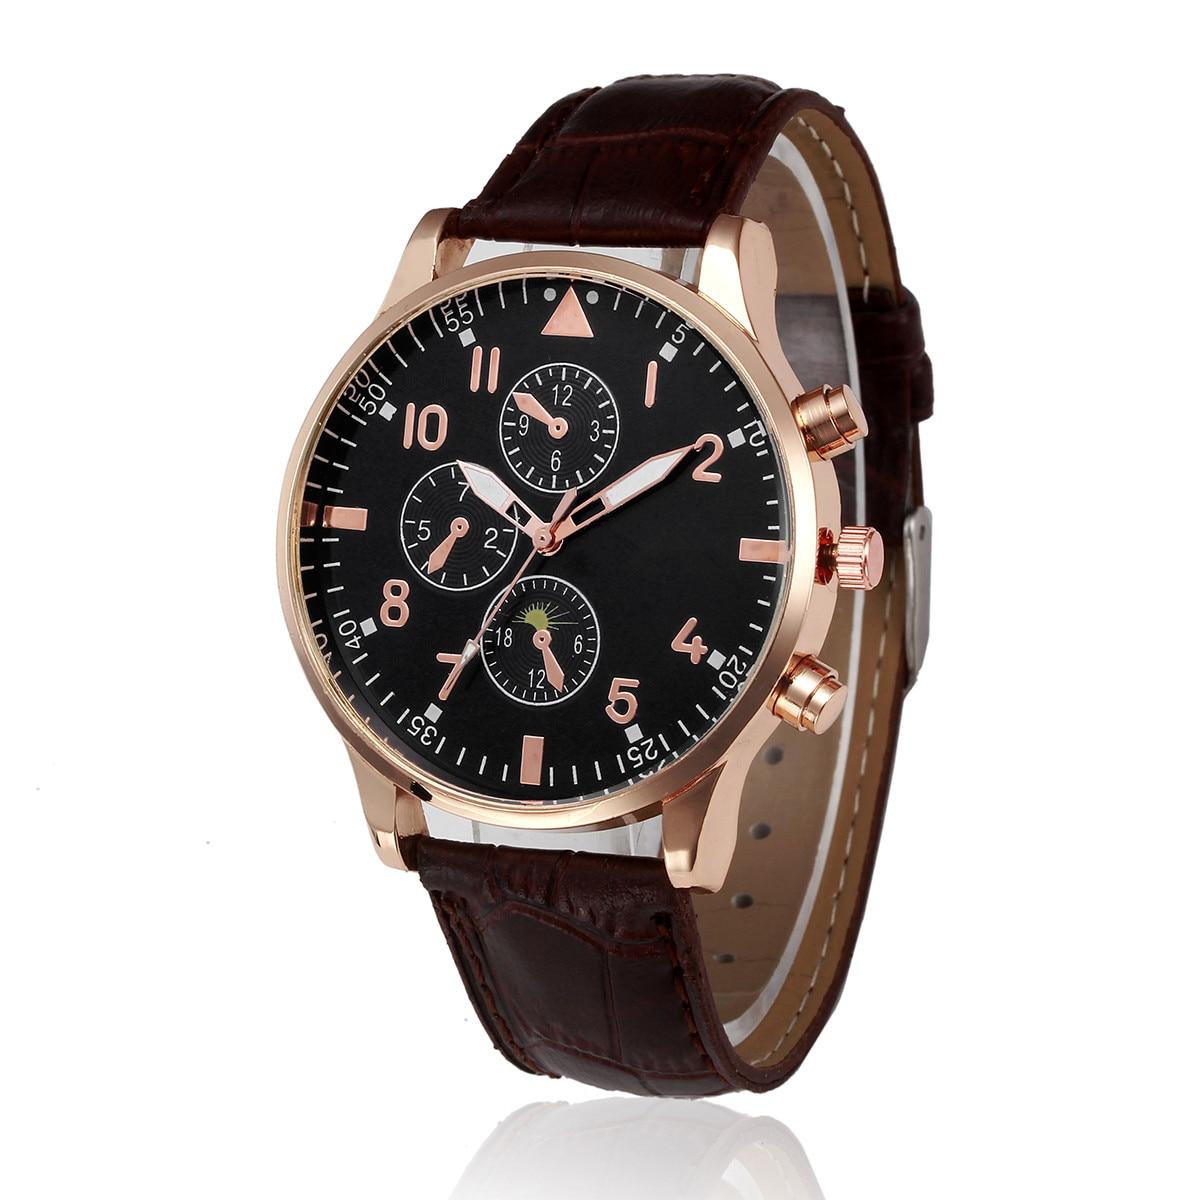 GEMIXI NEW Hot Sale Watch Men Relogio Masculino  Retro Design Leather Band Analog Alloy Quartz Wrist Watch Relojes Kol Saati